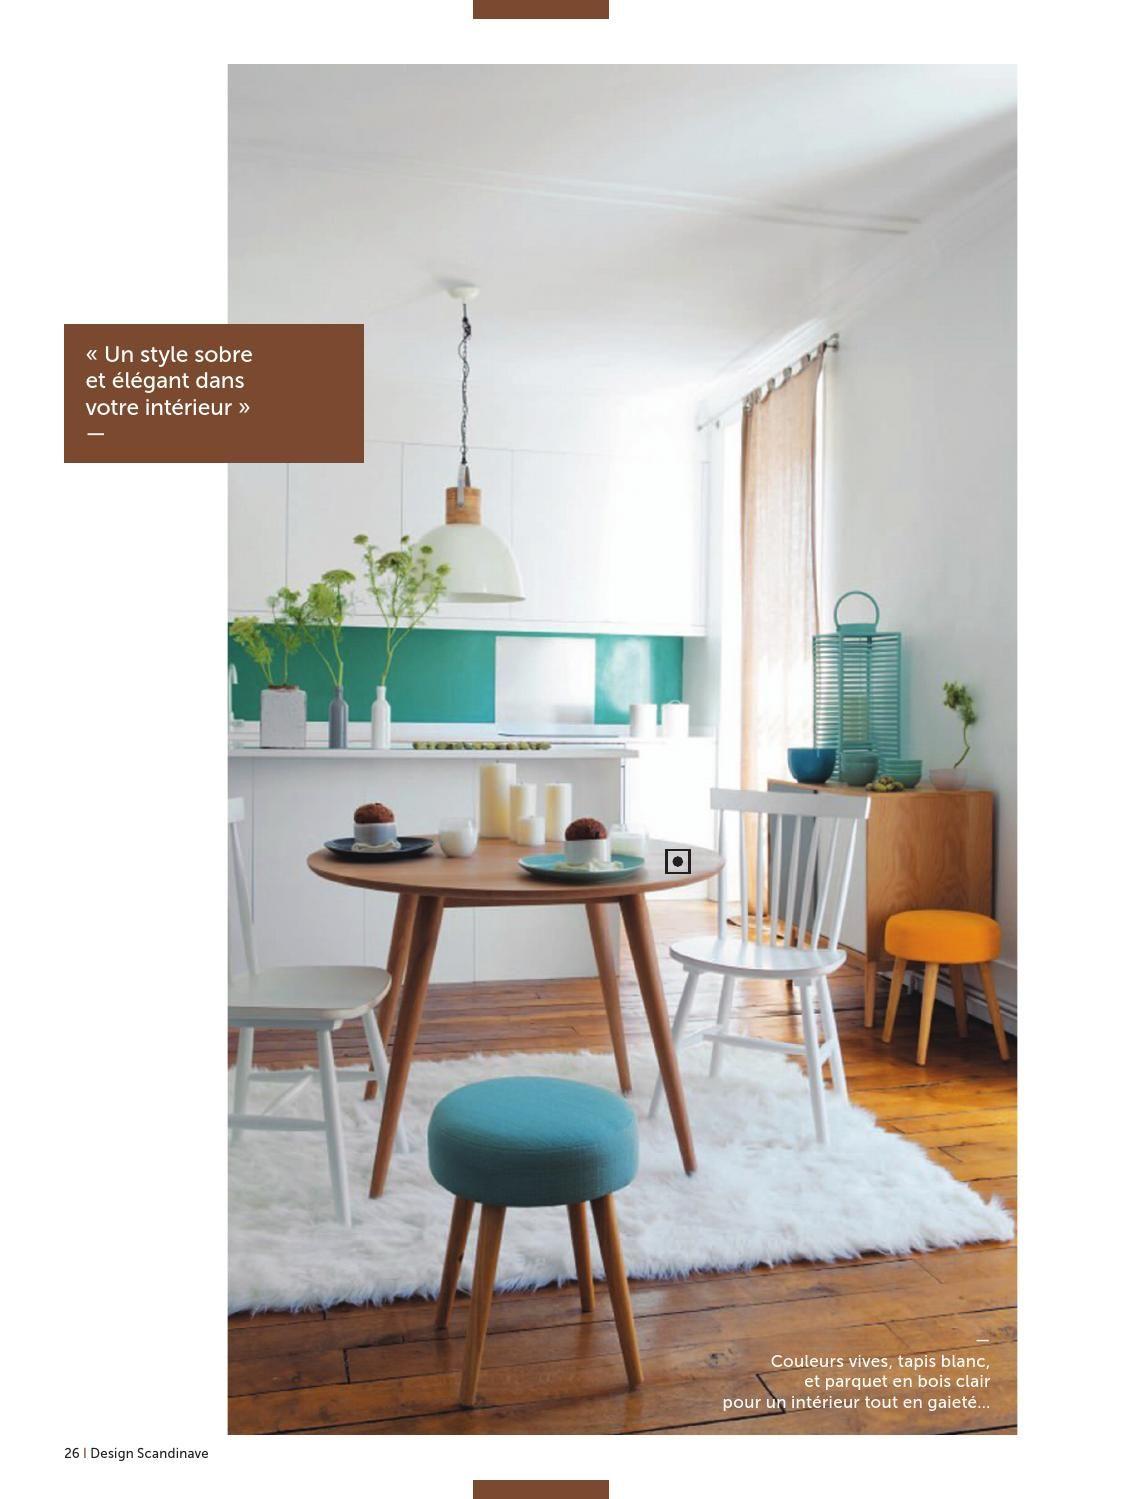 IKEA SELECT MAGAZINE Home, Home decor, Home deco